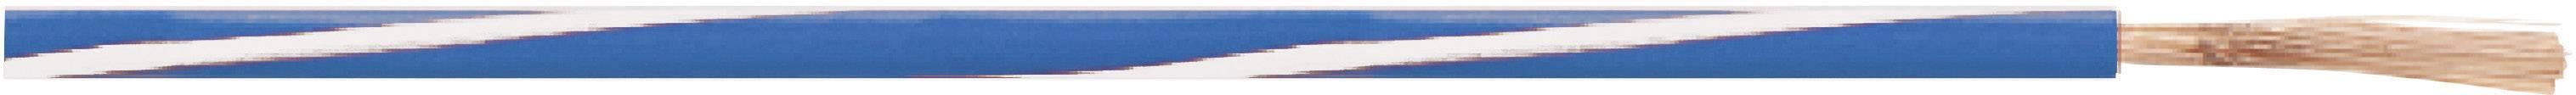 Opletenie / lanko LappKabel 4512922S X05V-K, 1 x 0.75 mm², vonkajší Ø 2.40 mm, metrový tovar, tmavomodrá, biela